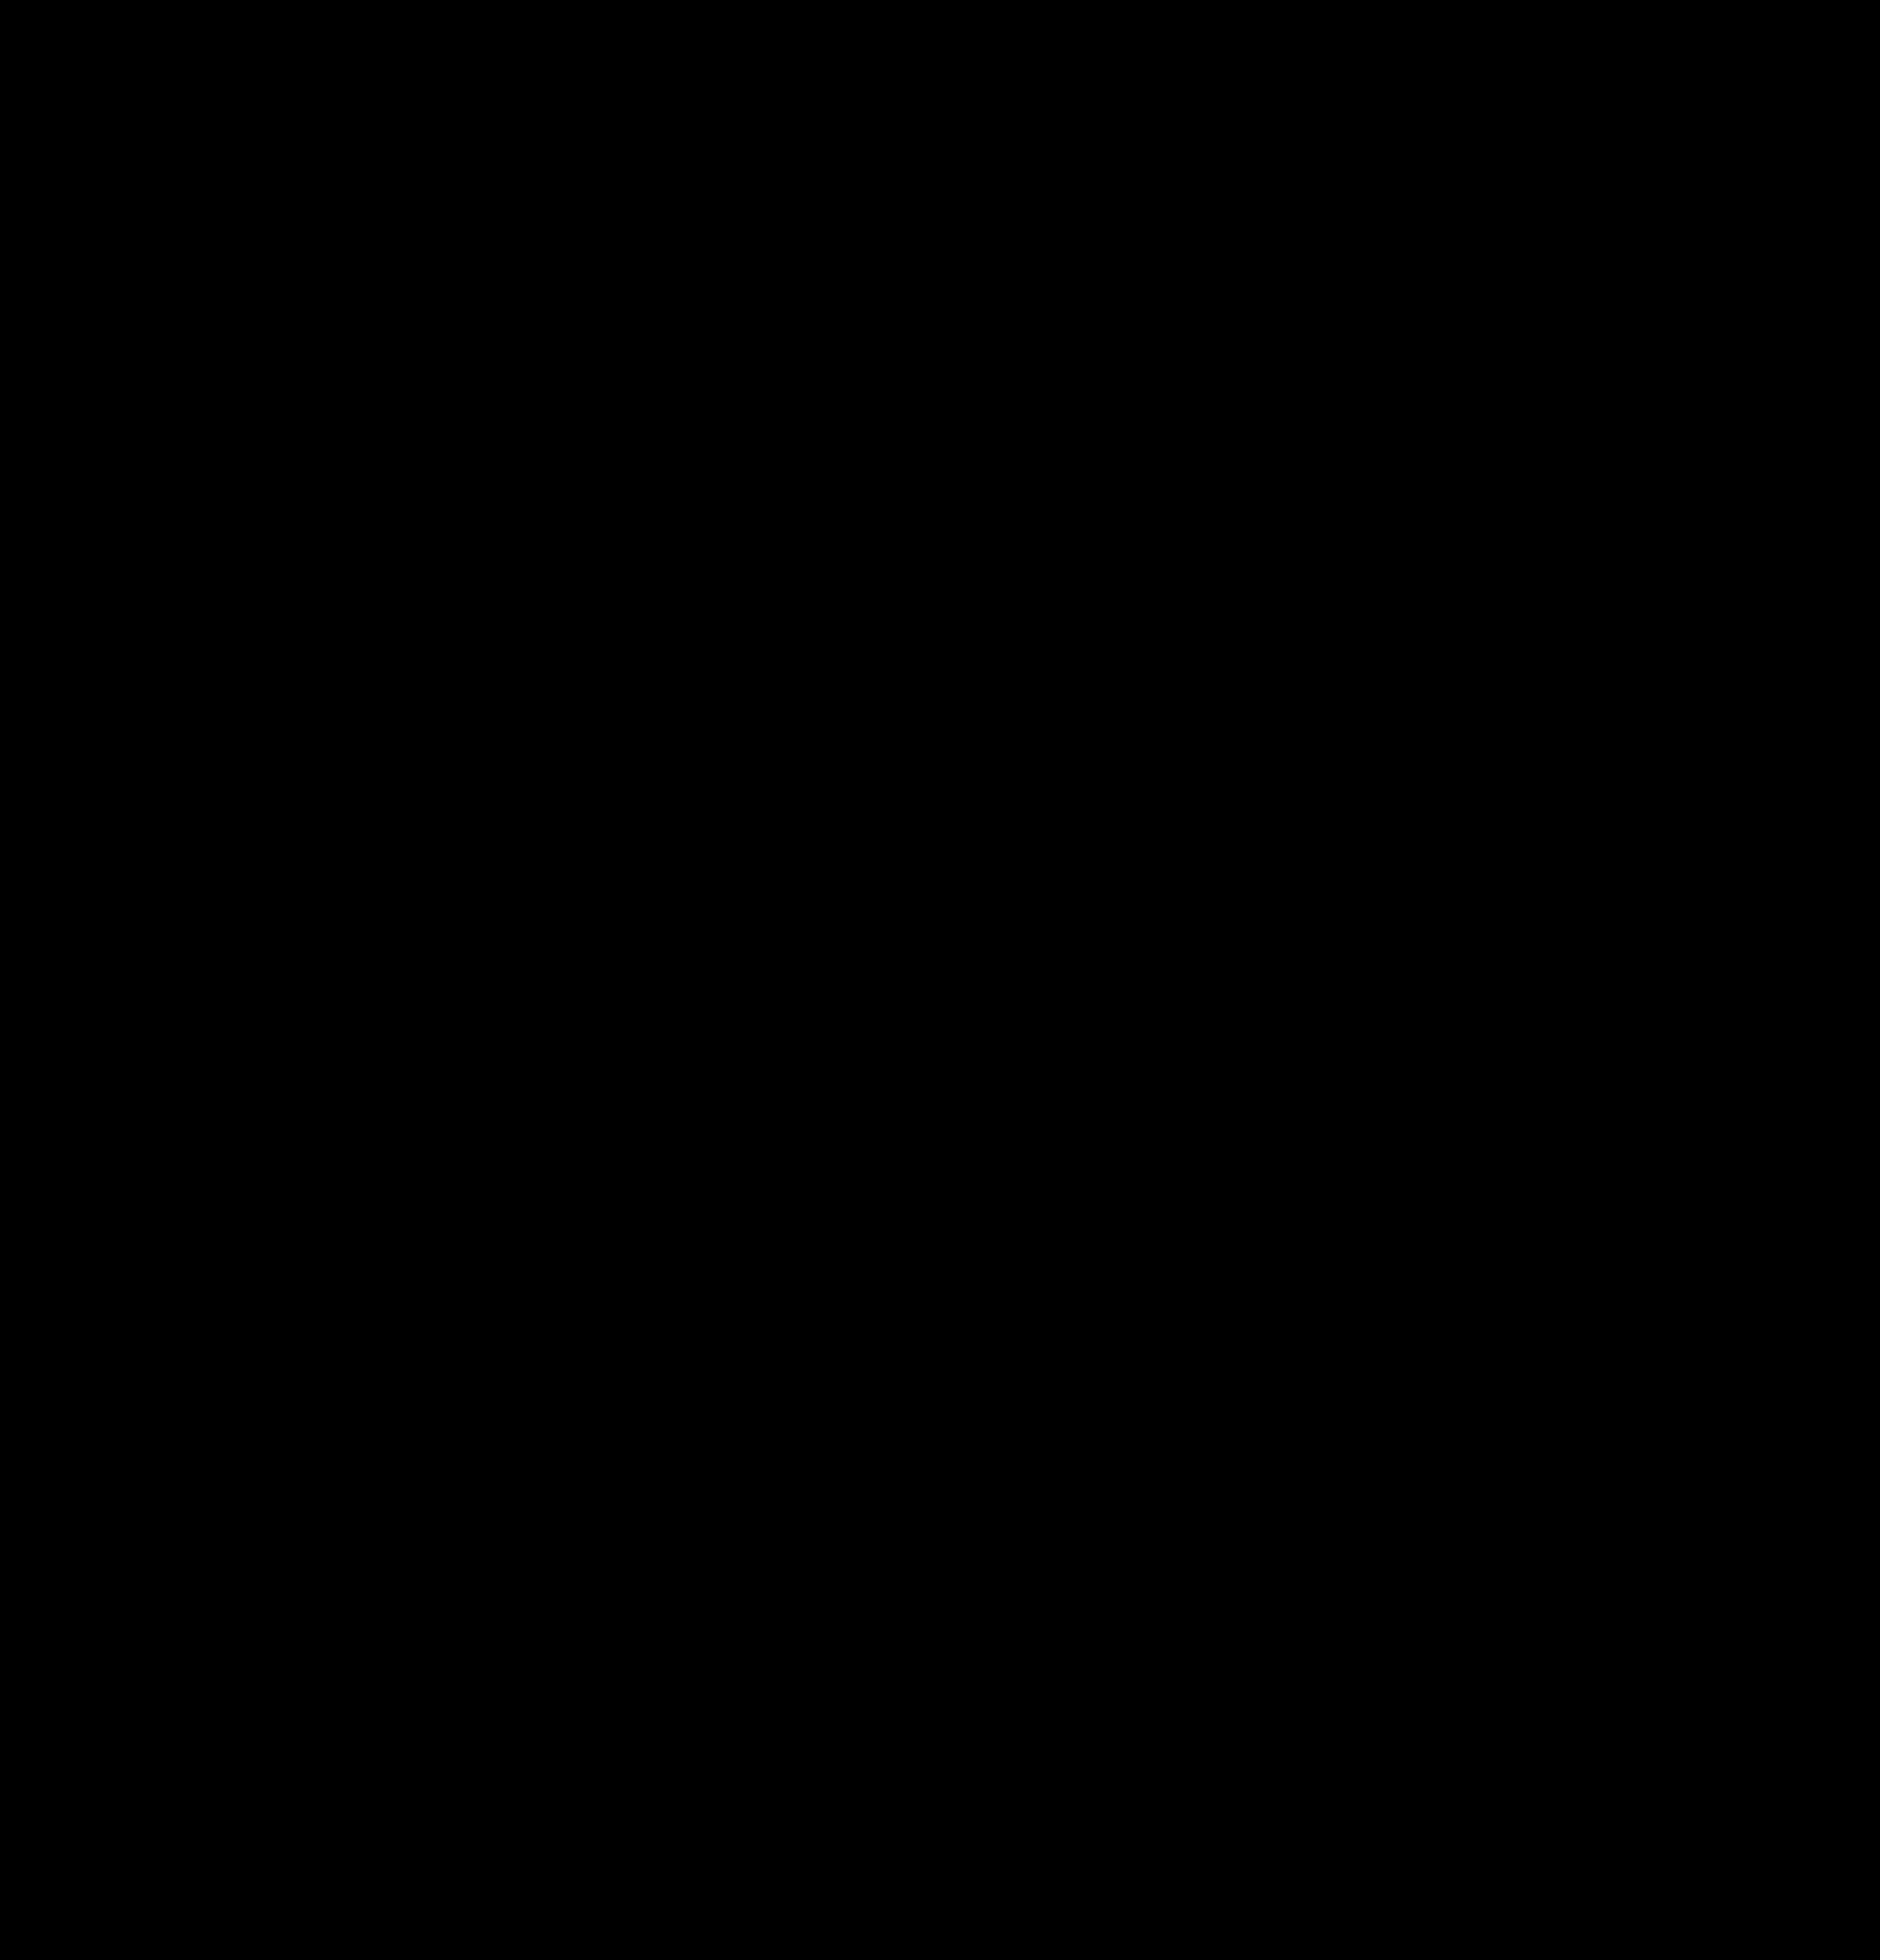 2235x2330 Clipart